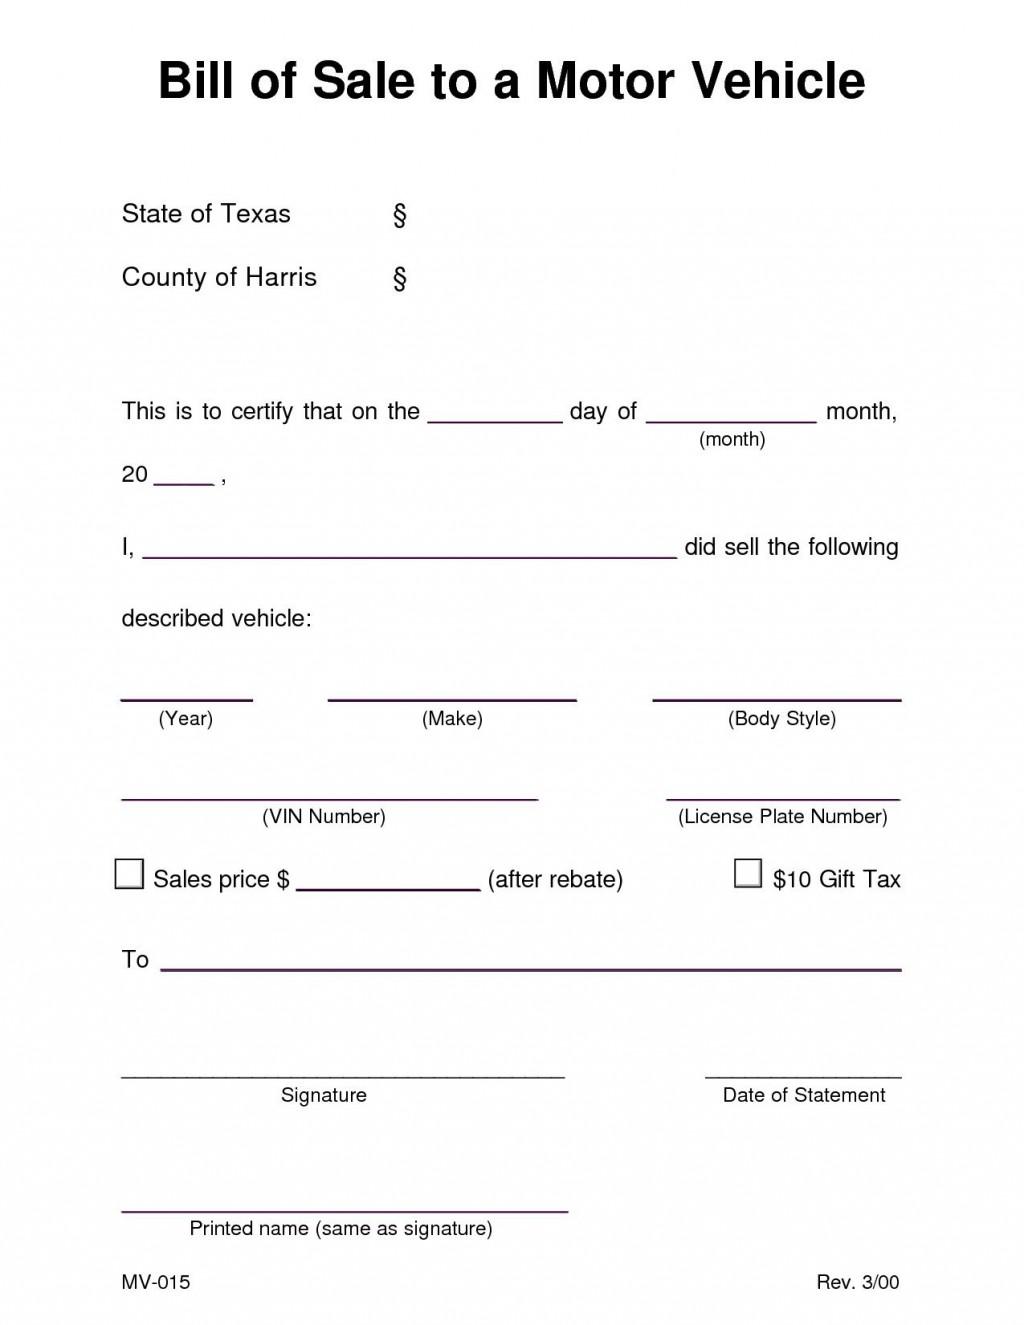 001 Shocking Bill Of Sale Template Texa Concept  Texas Free Car Form Dmv DocumentLarge